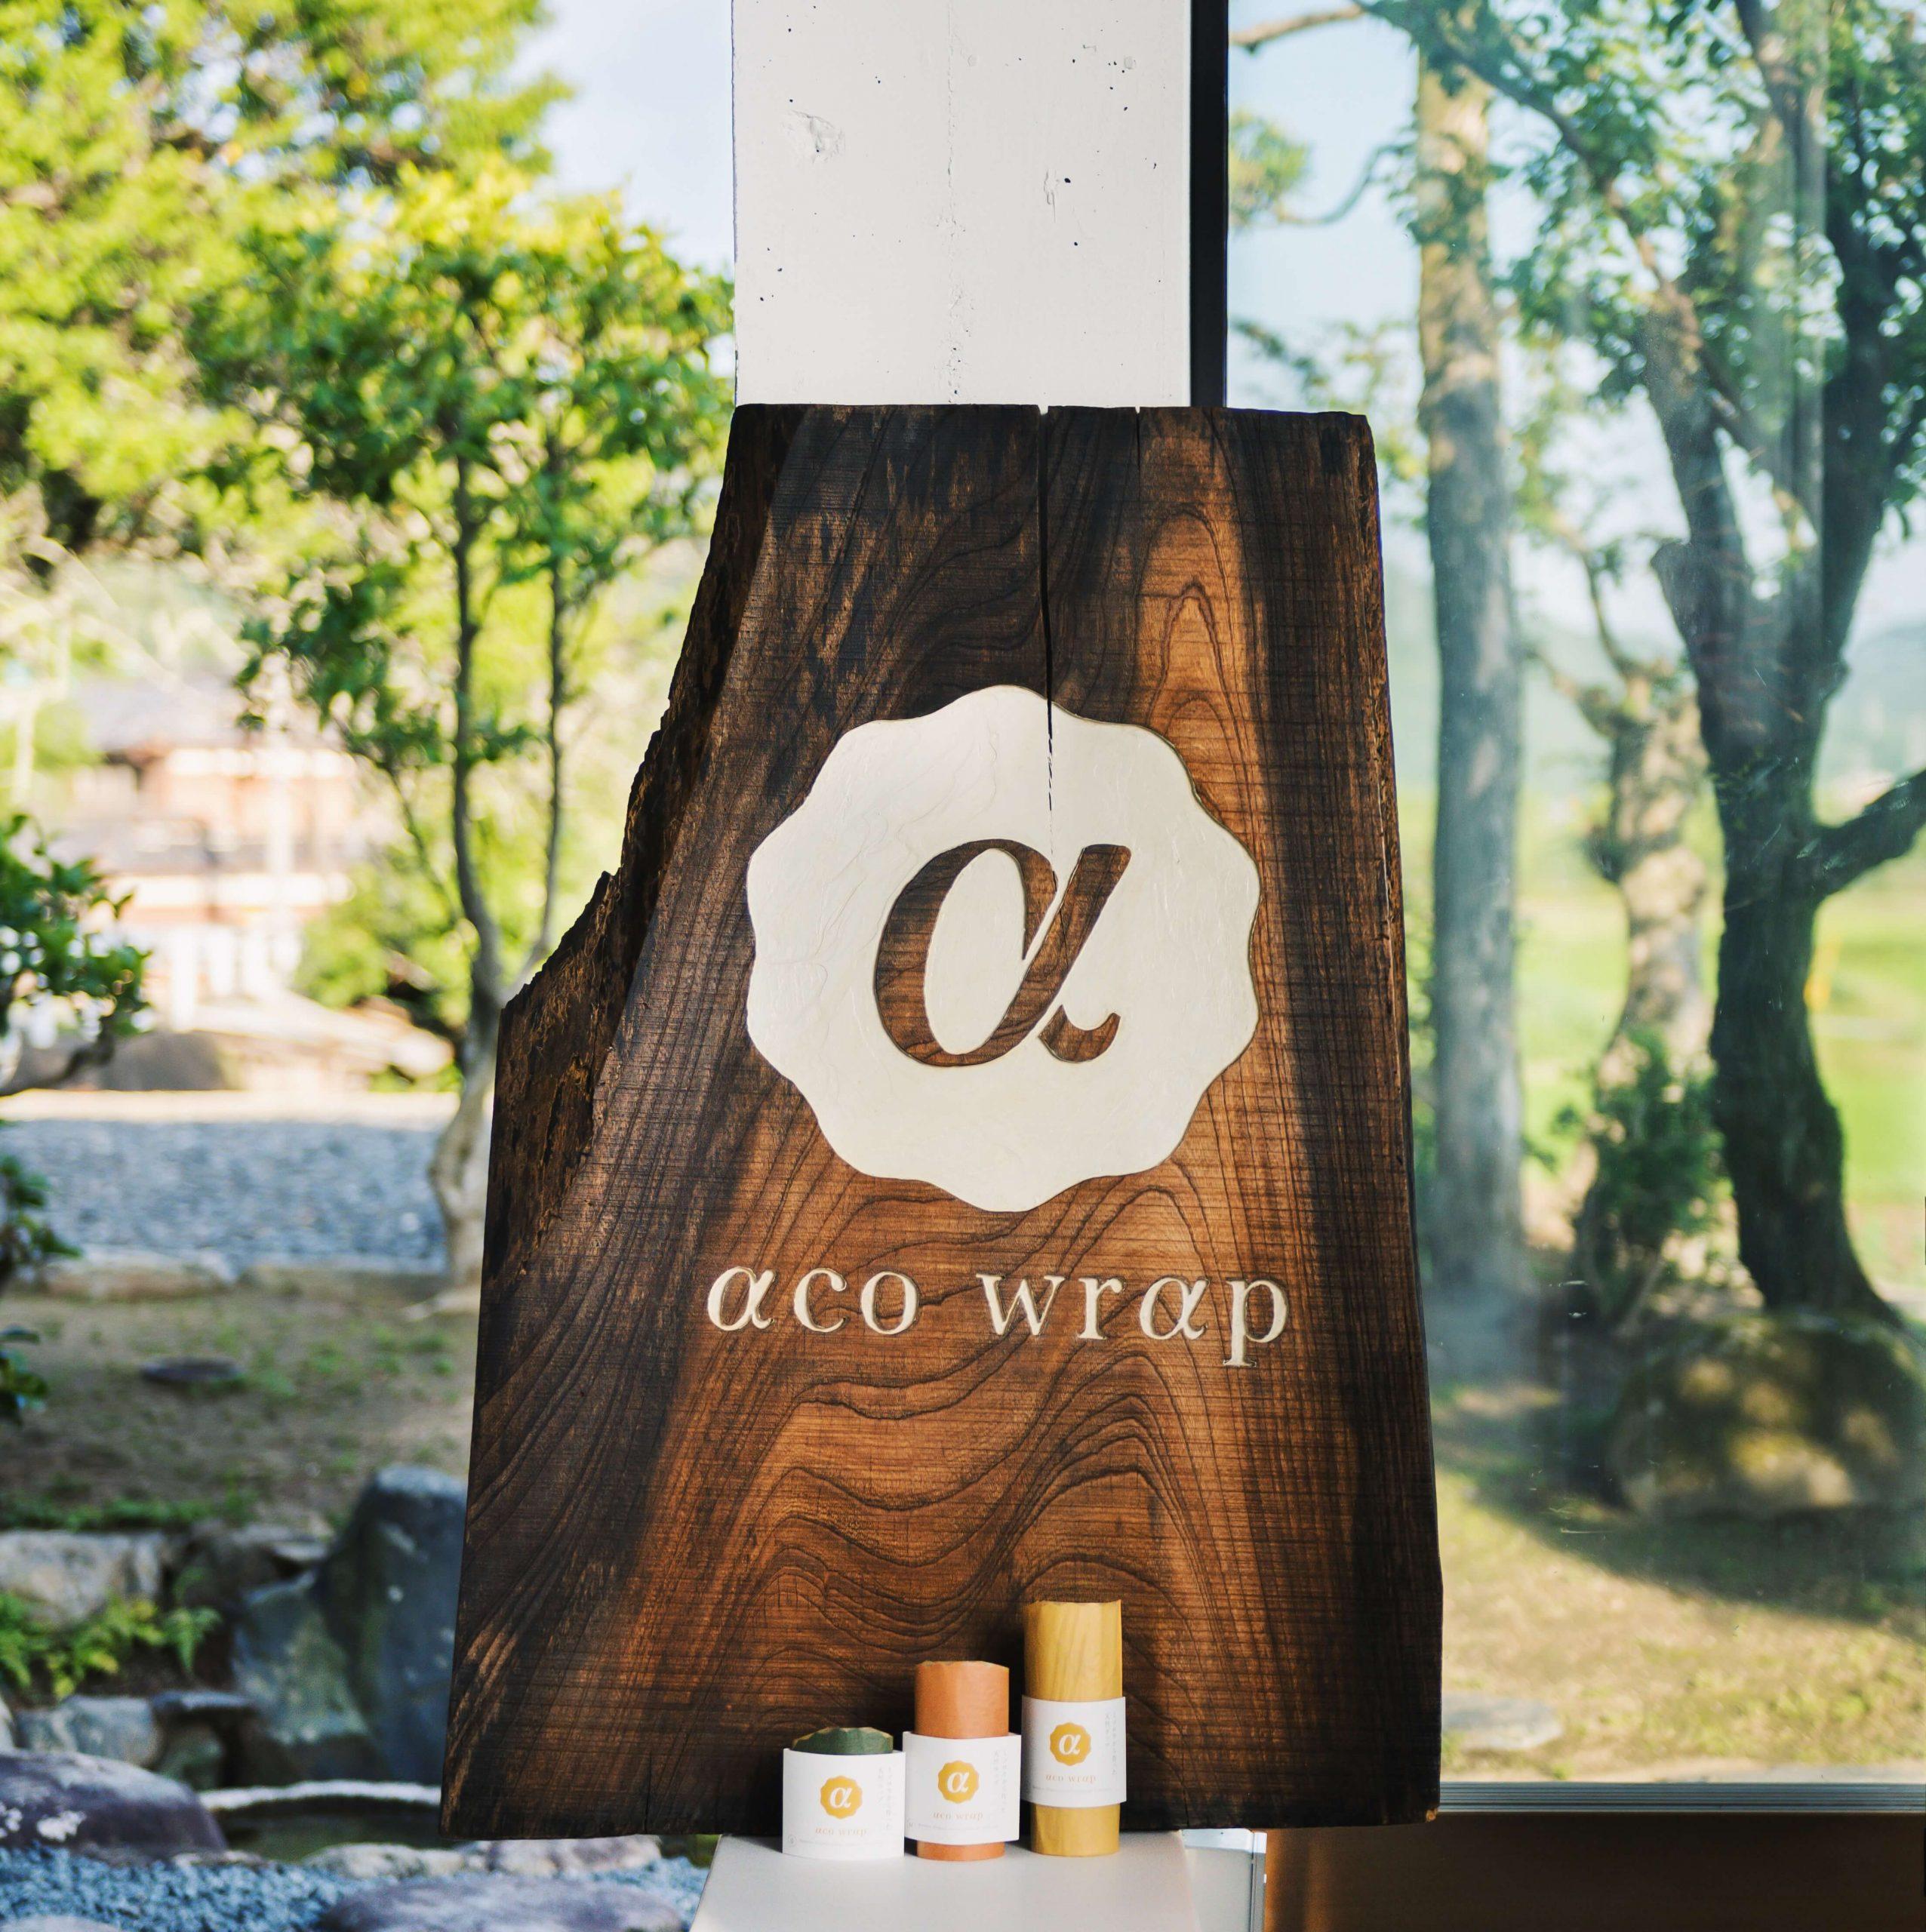 acowrapの看板と商品